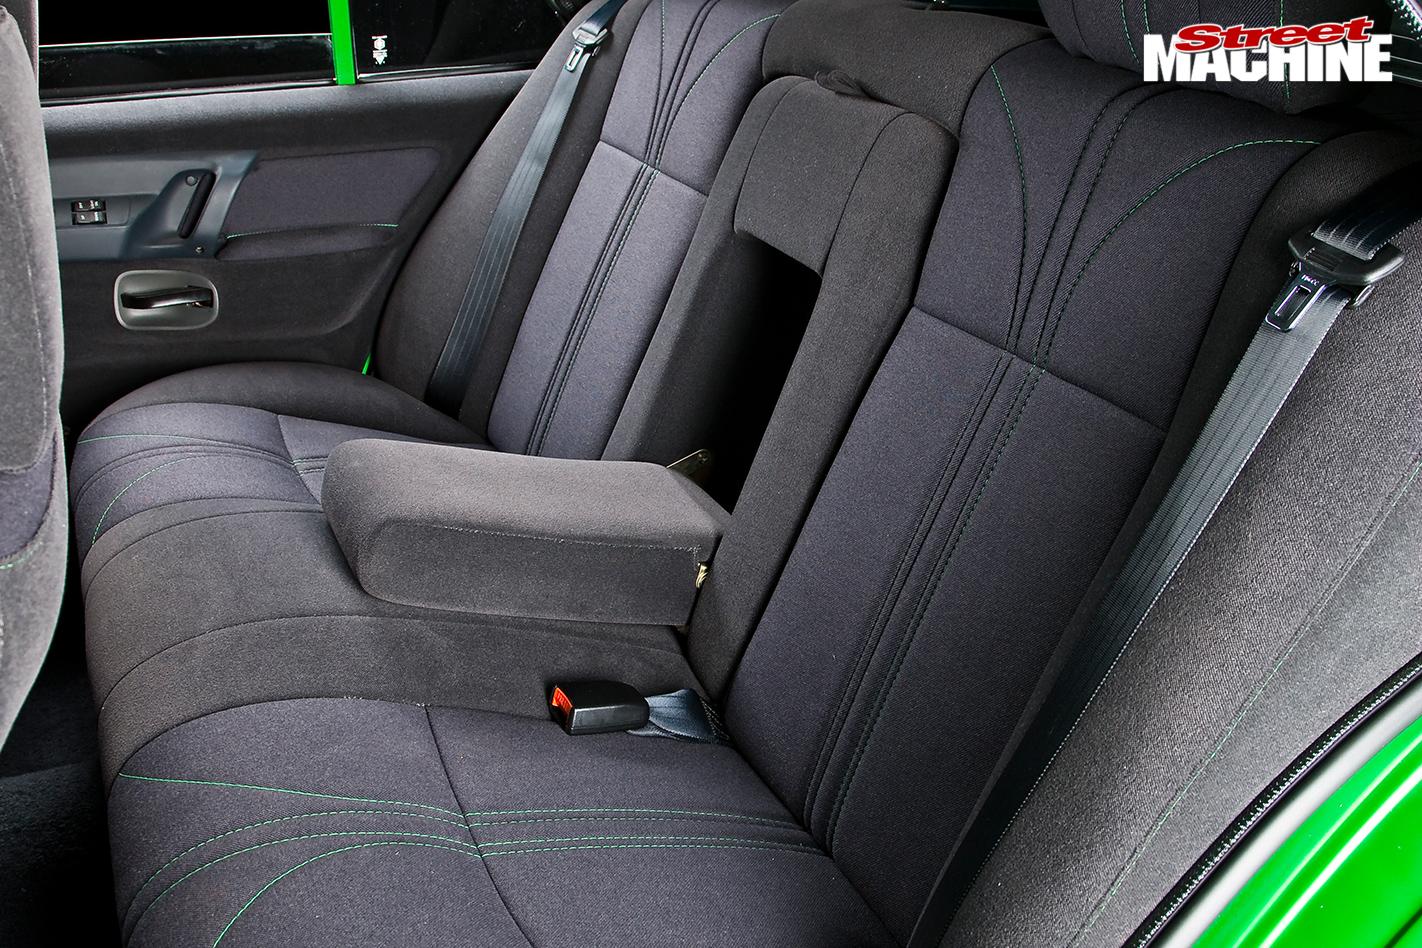 Ford -xe -falcon -interior -rear